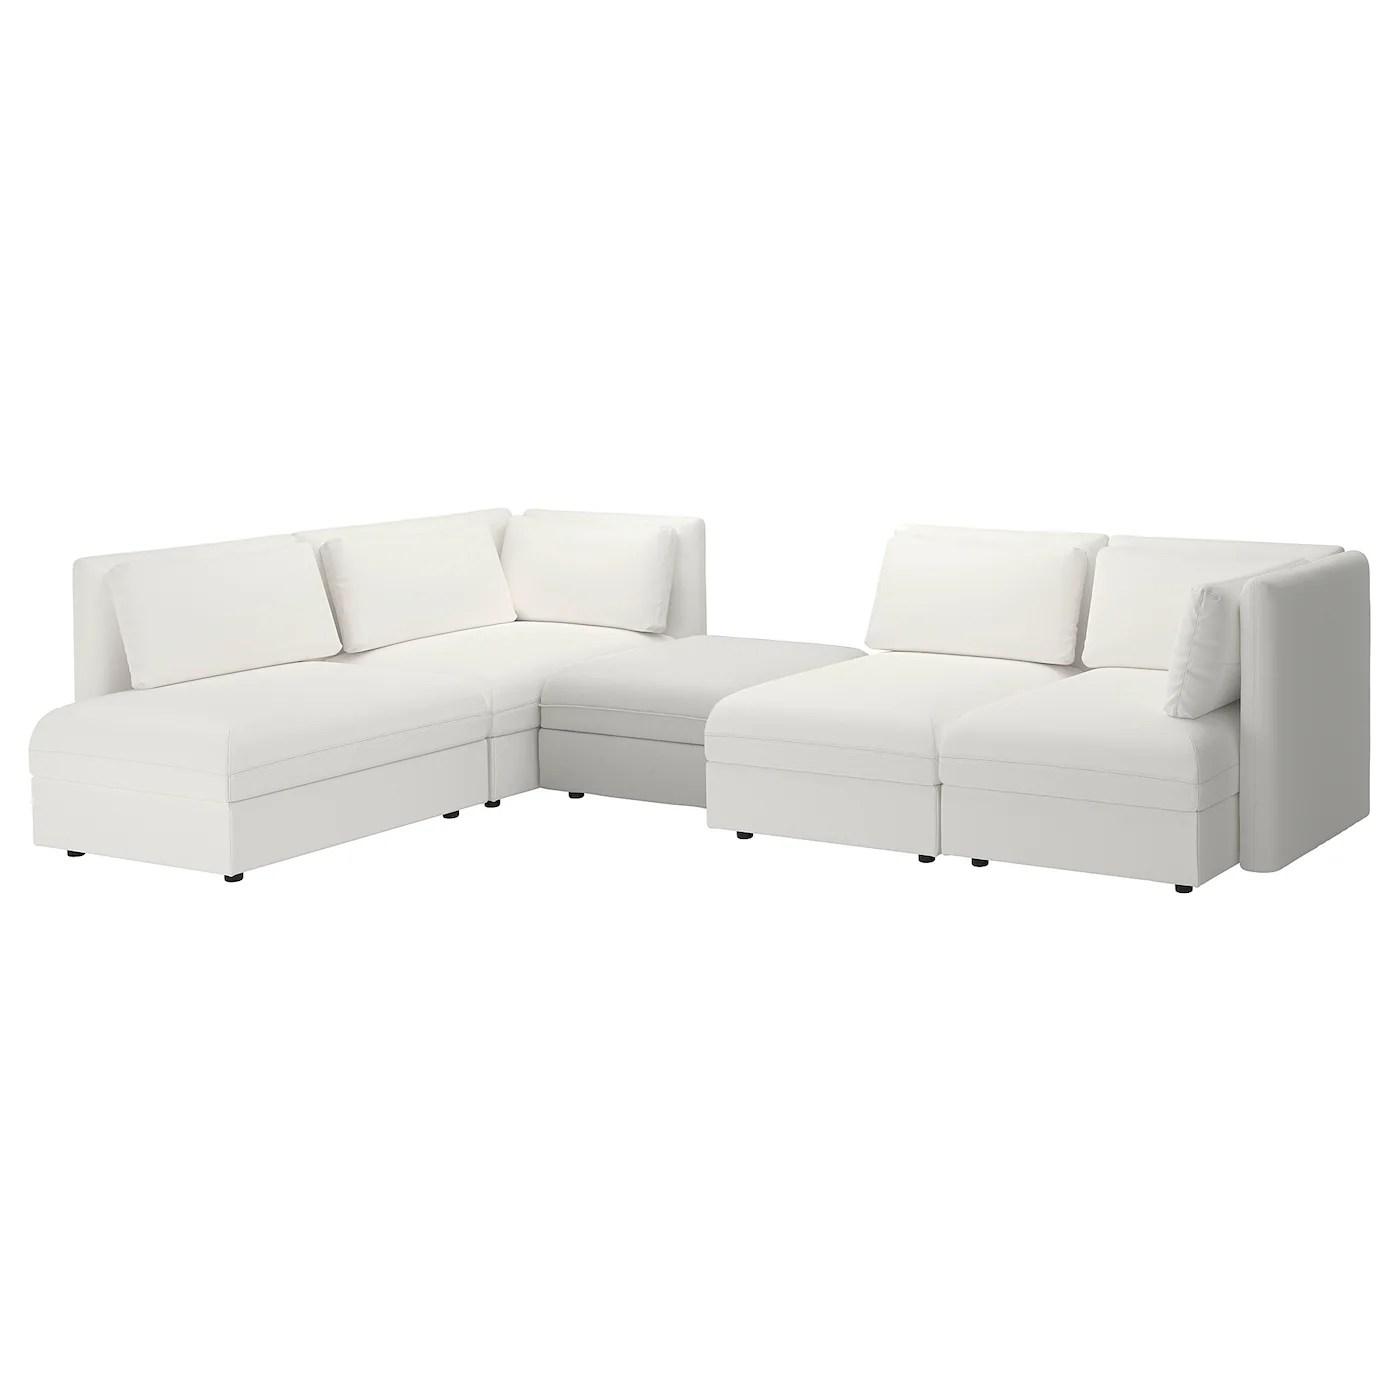 modular sofas ireland modern las vegas fabric ikea dublin